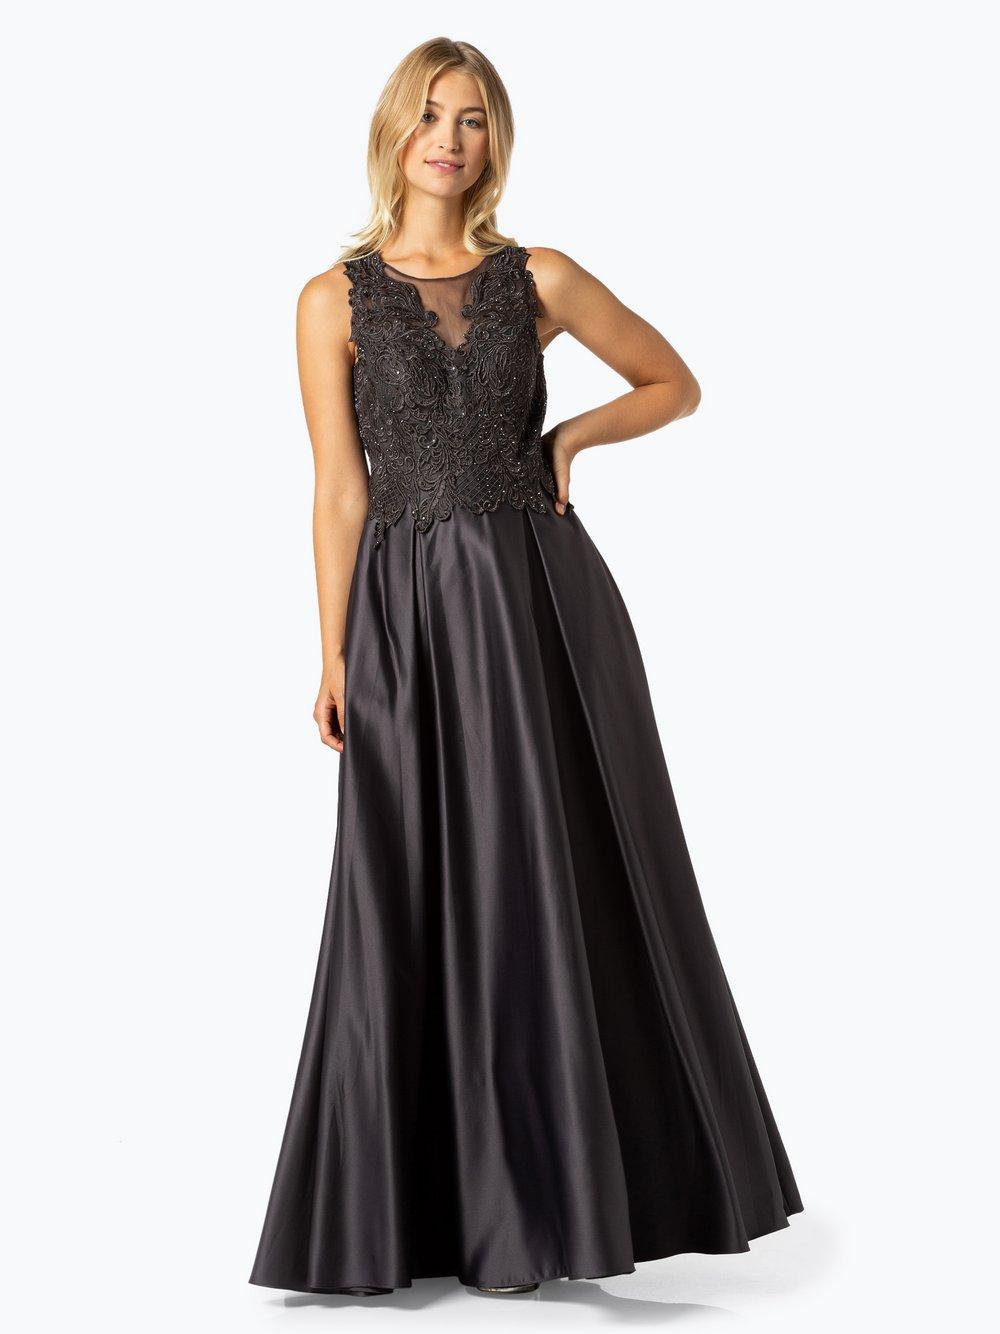 VM – Damska sukienka wieczorowa, szary Van Graaf 449216-0001-00360